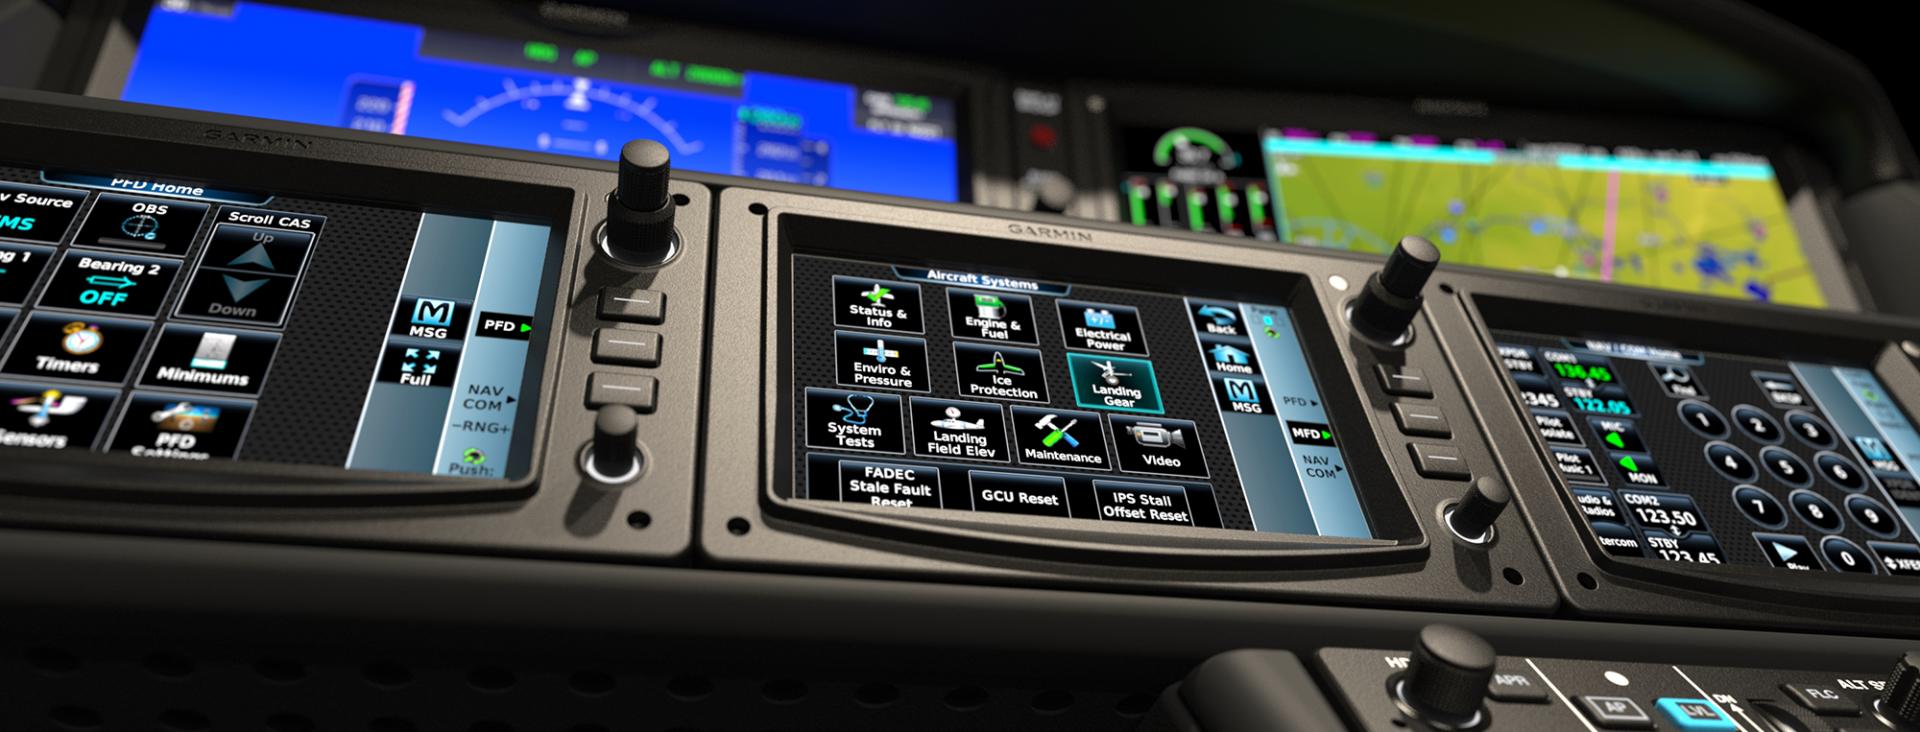 avionics-brochure-01-3